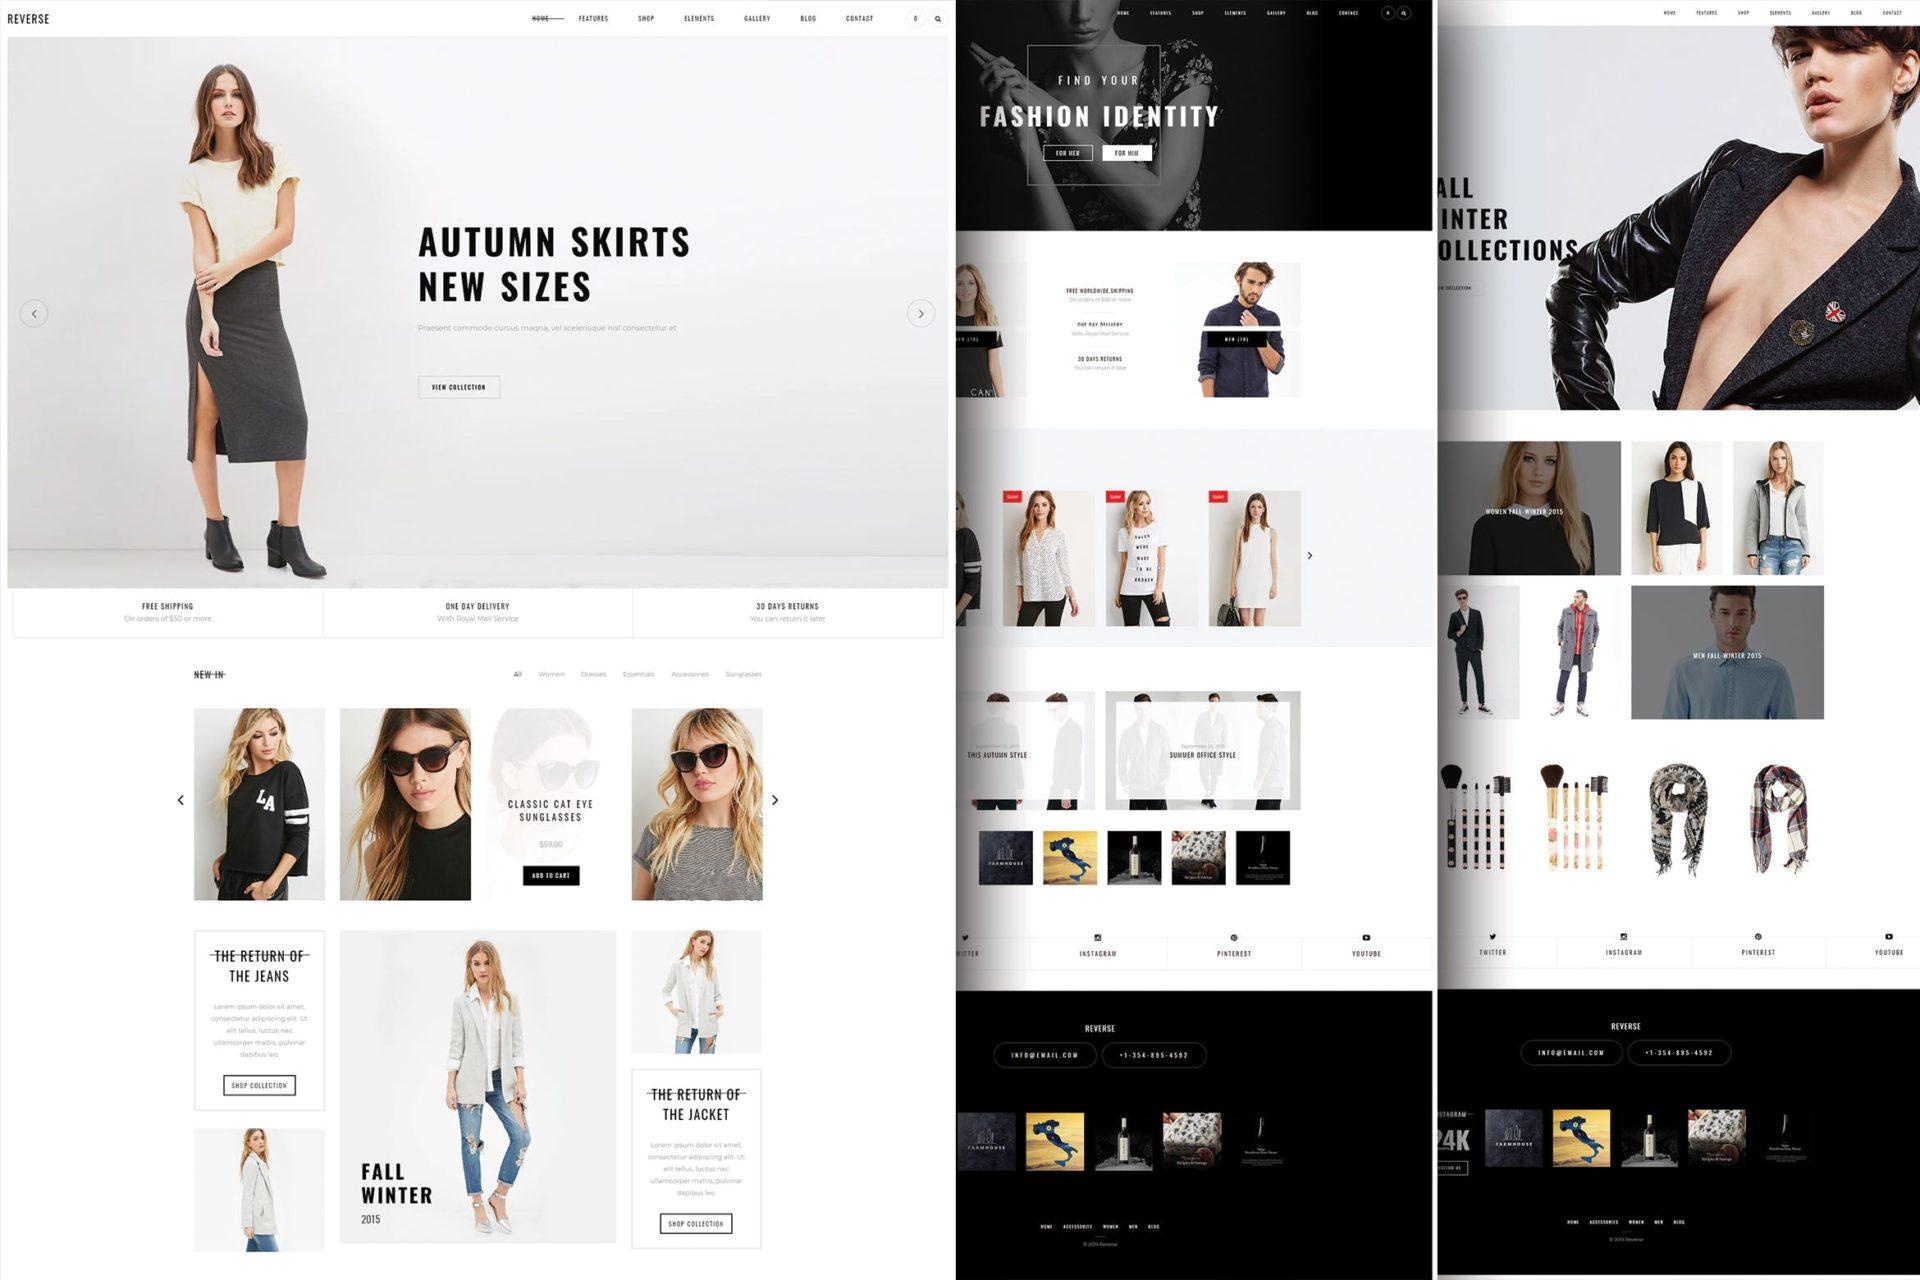 INSPIRANTE Werbeagentur E Commerce Shops nbsp| Inspirante Werbeagentur UG